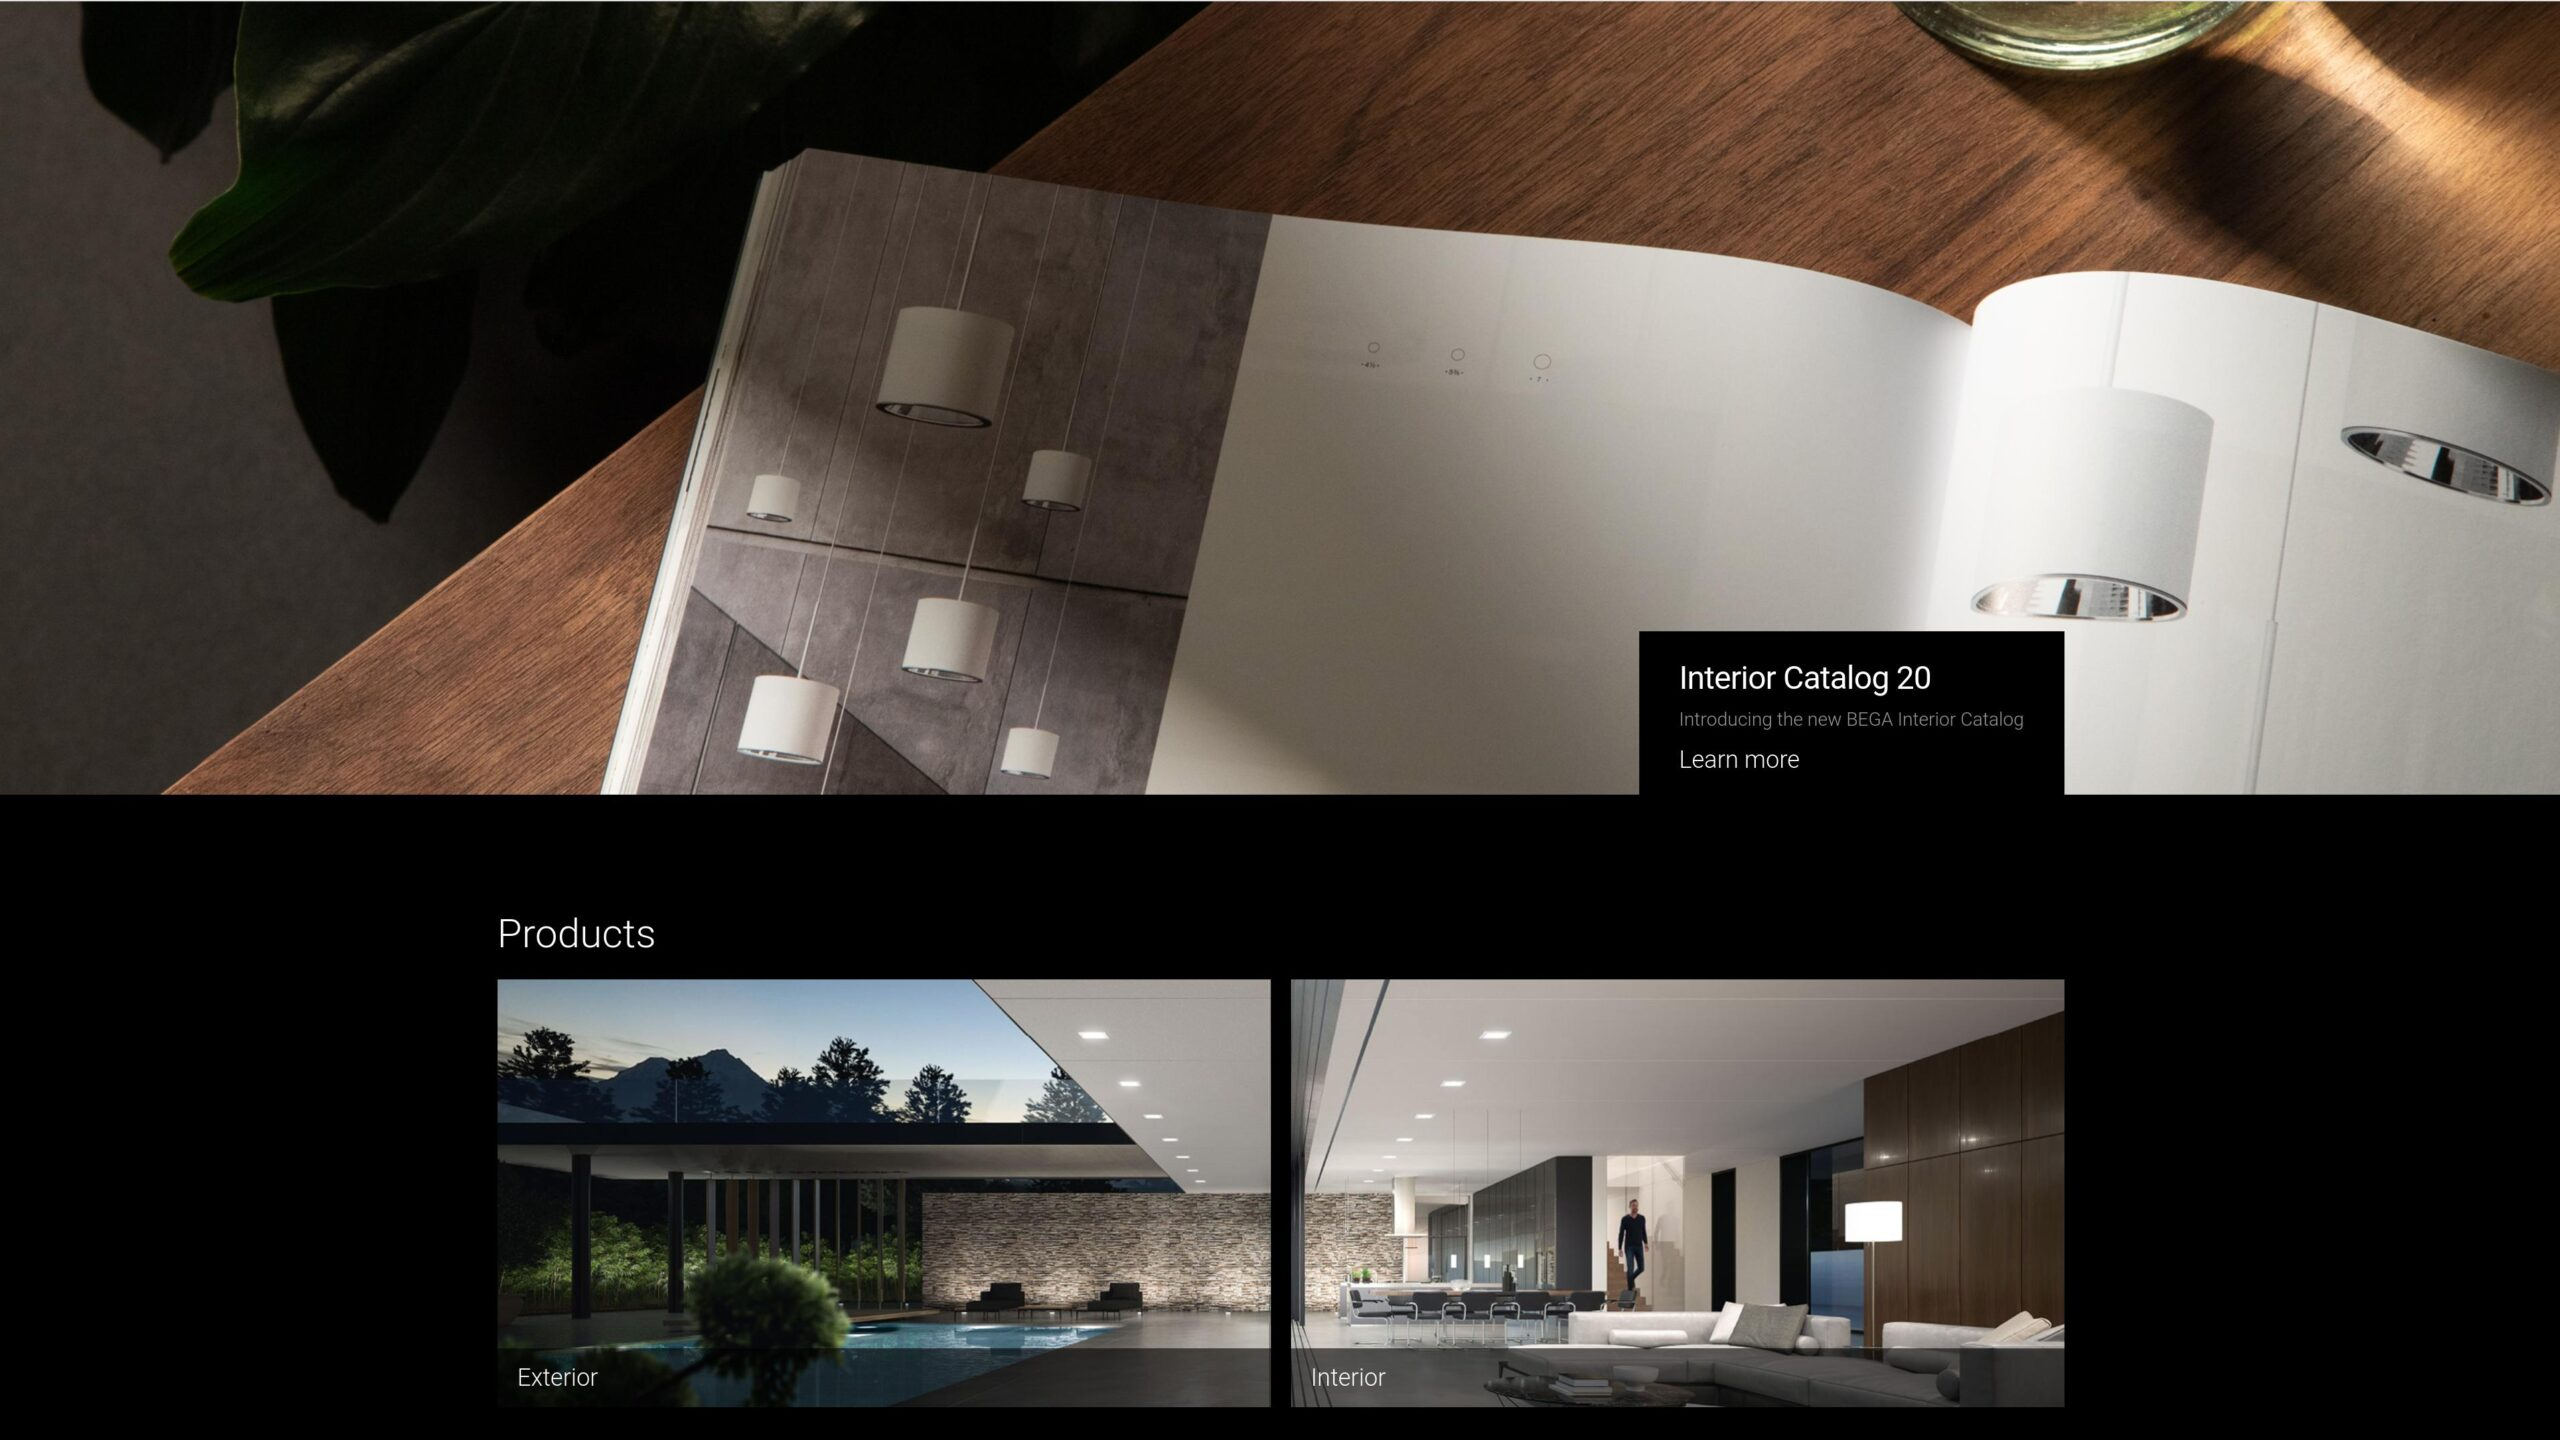 Orpetron Web Design Awards - Bega - Web Design Awards Inspiration Trends UI UX